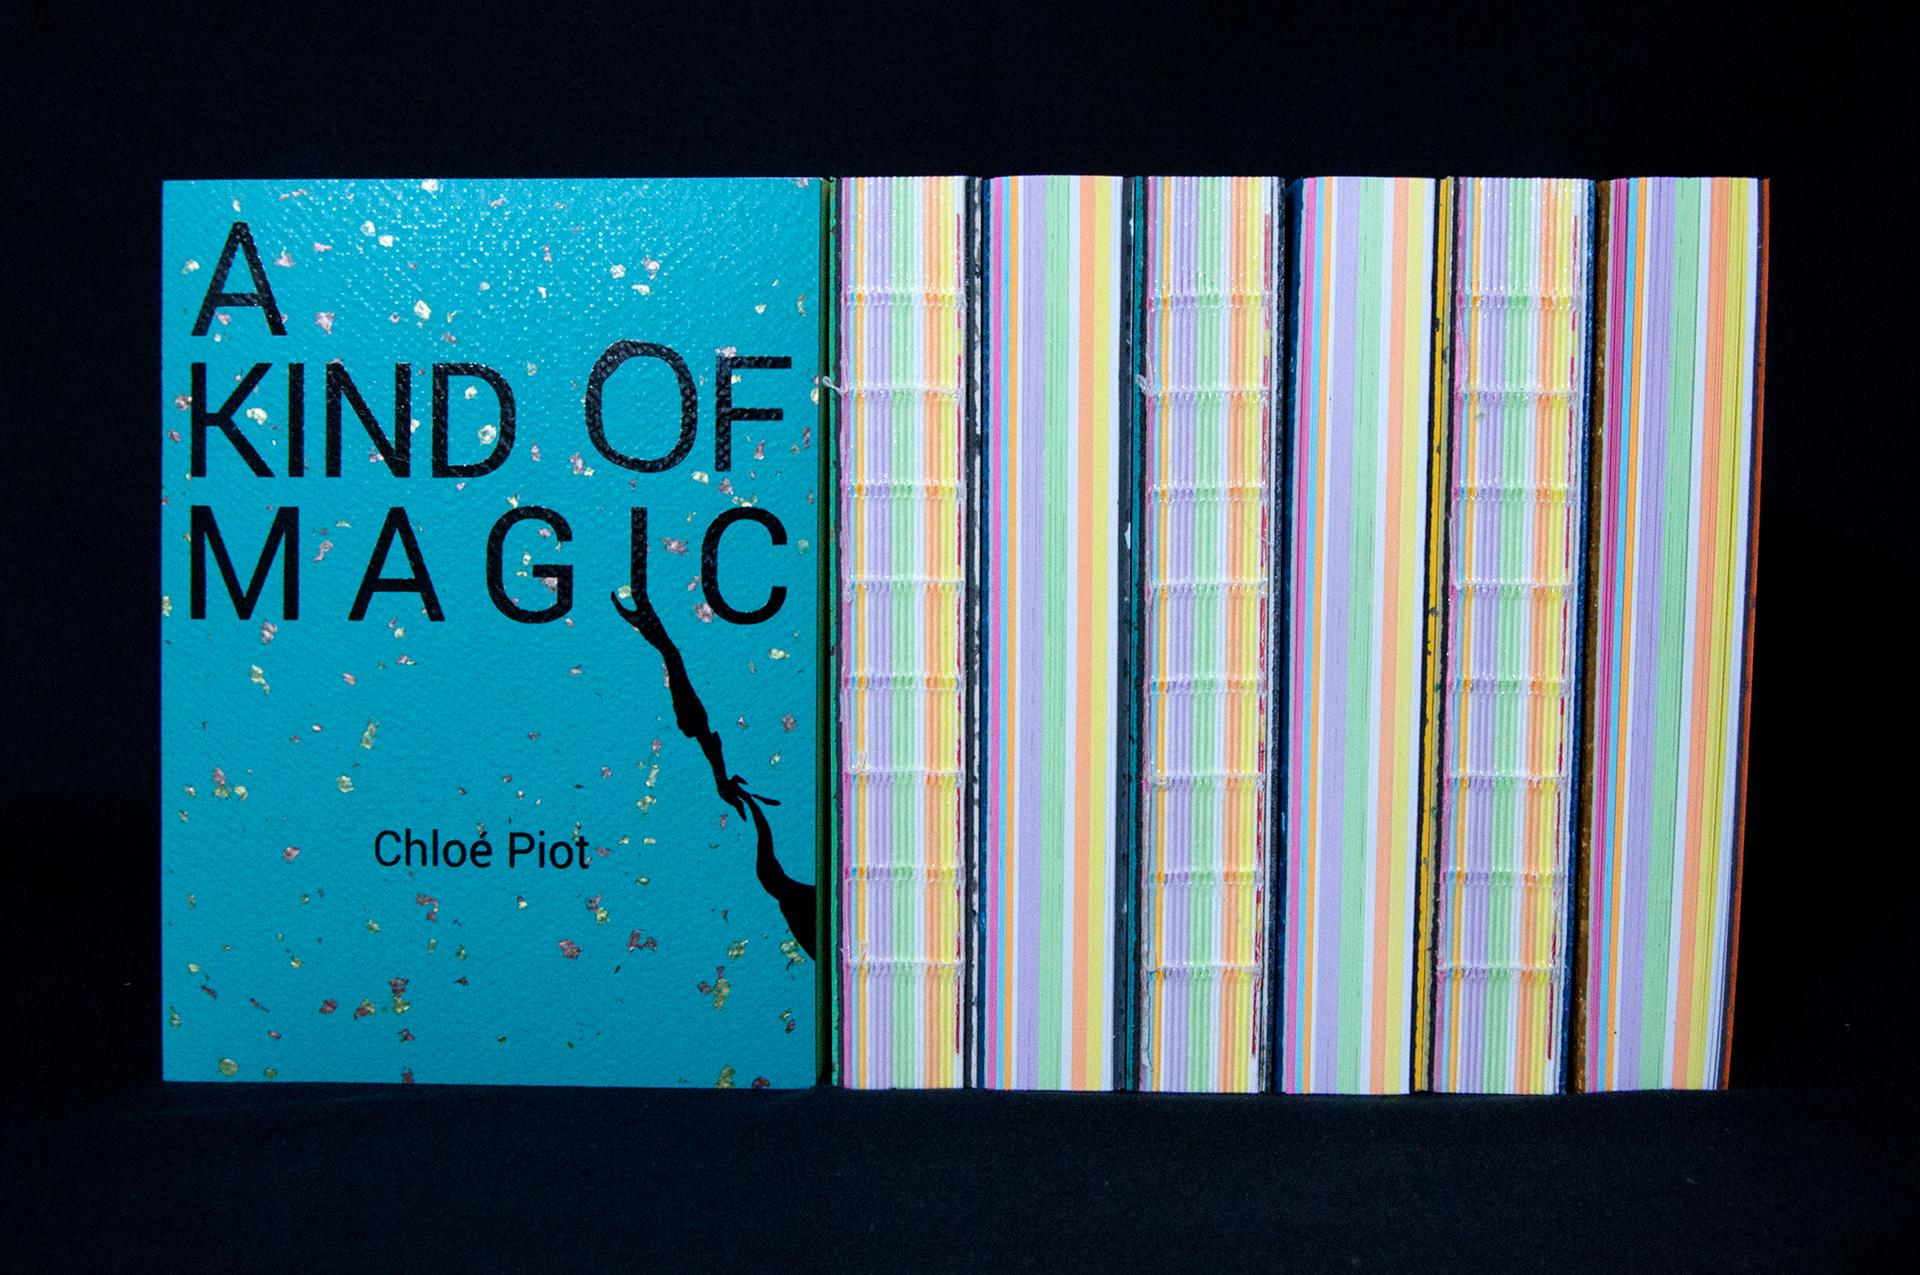 A Kind of Magic - Chloé Piot